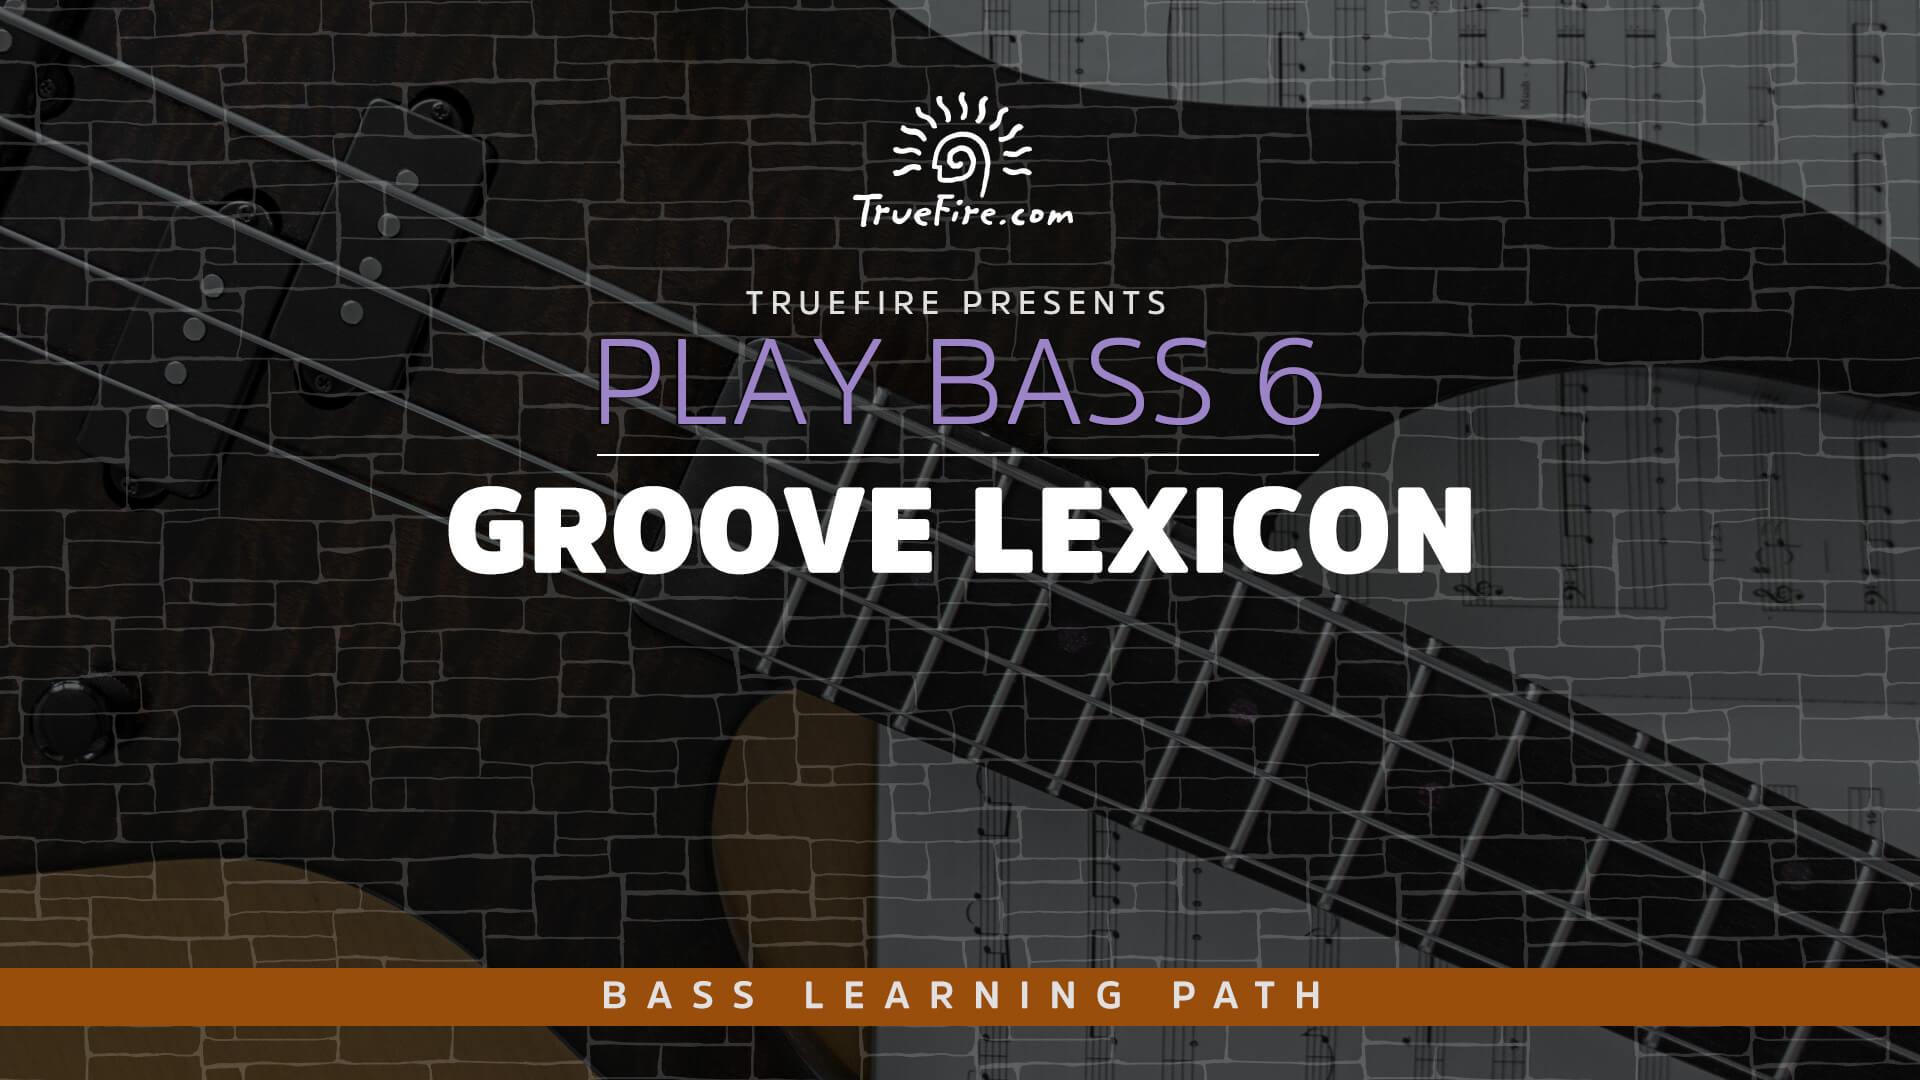 Play Bass Guitar 6: Essential Skills - Bass Lessons - TrueFire